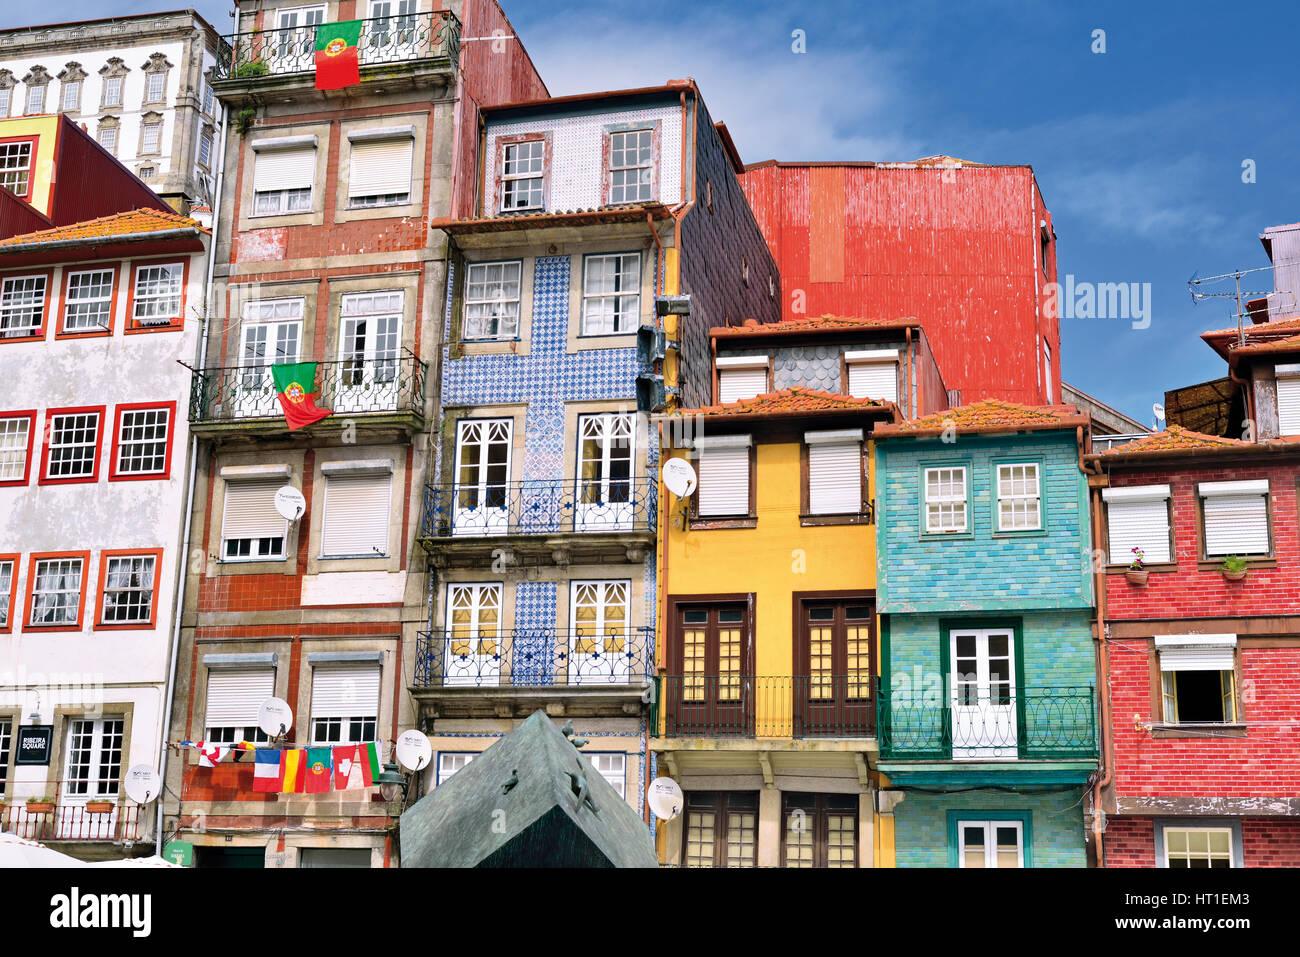 portugal traditionelle h user im riverside township ribeira in porto stockfoto bild 135257811. Black Bedroom Furniture Sets. Home Design Ideas